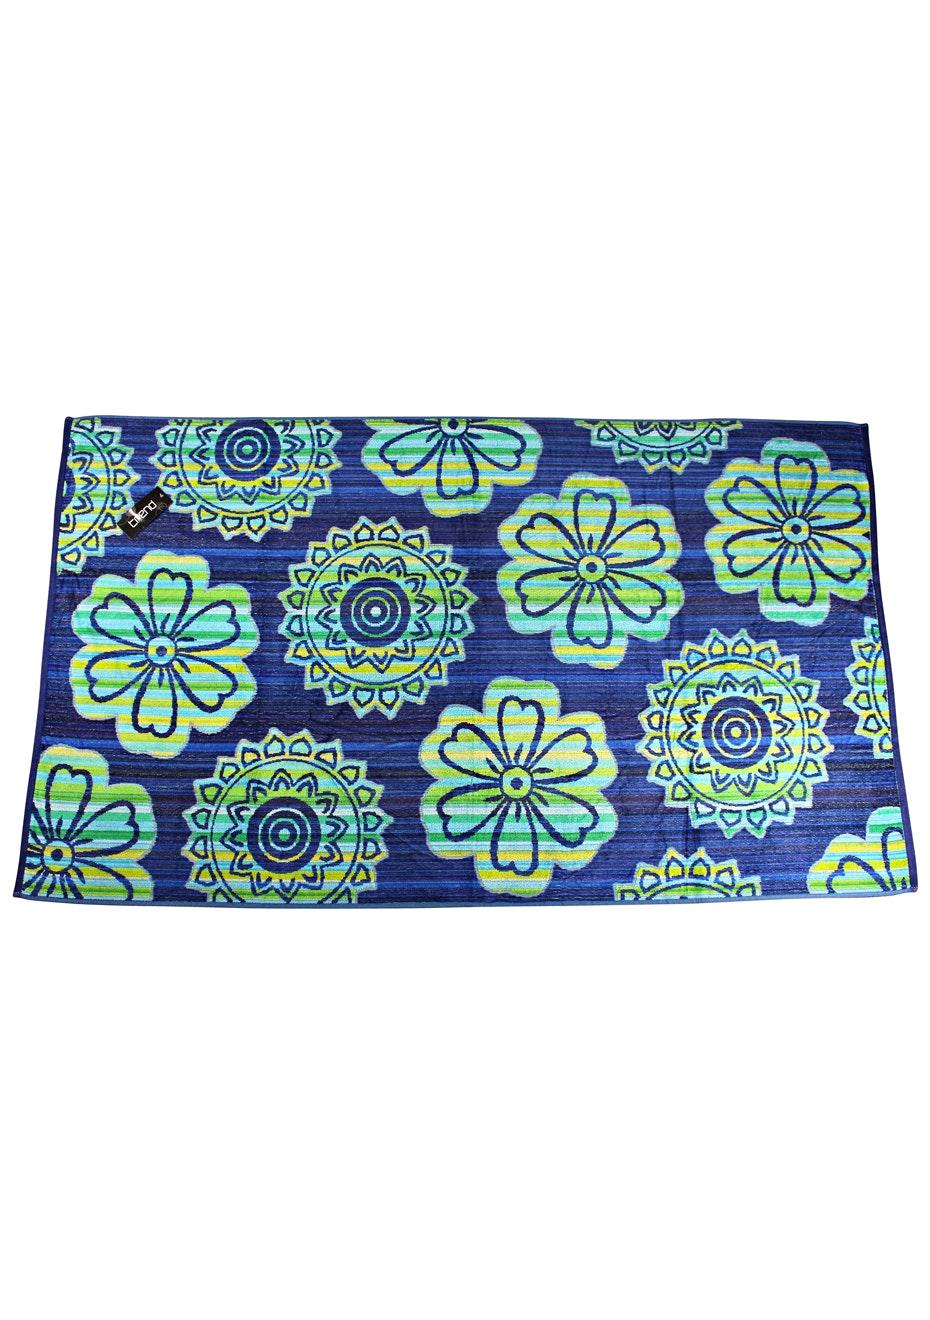 Perasi 100% Cotton Velour Jacquard Beach Towel - 100x180cm